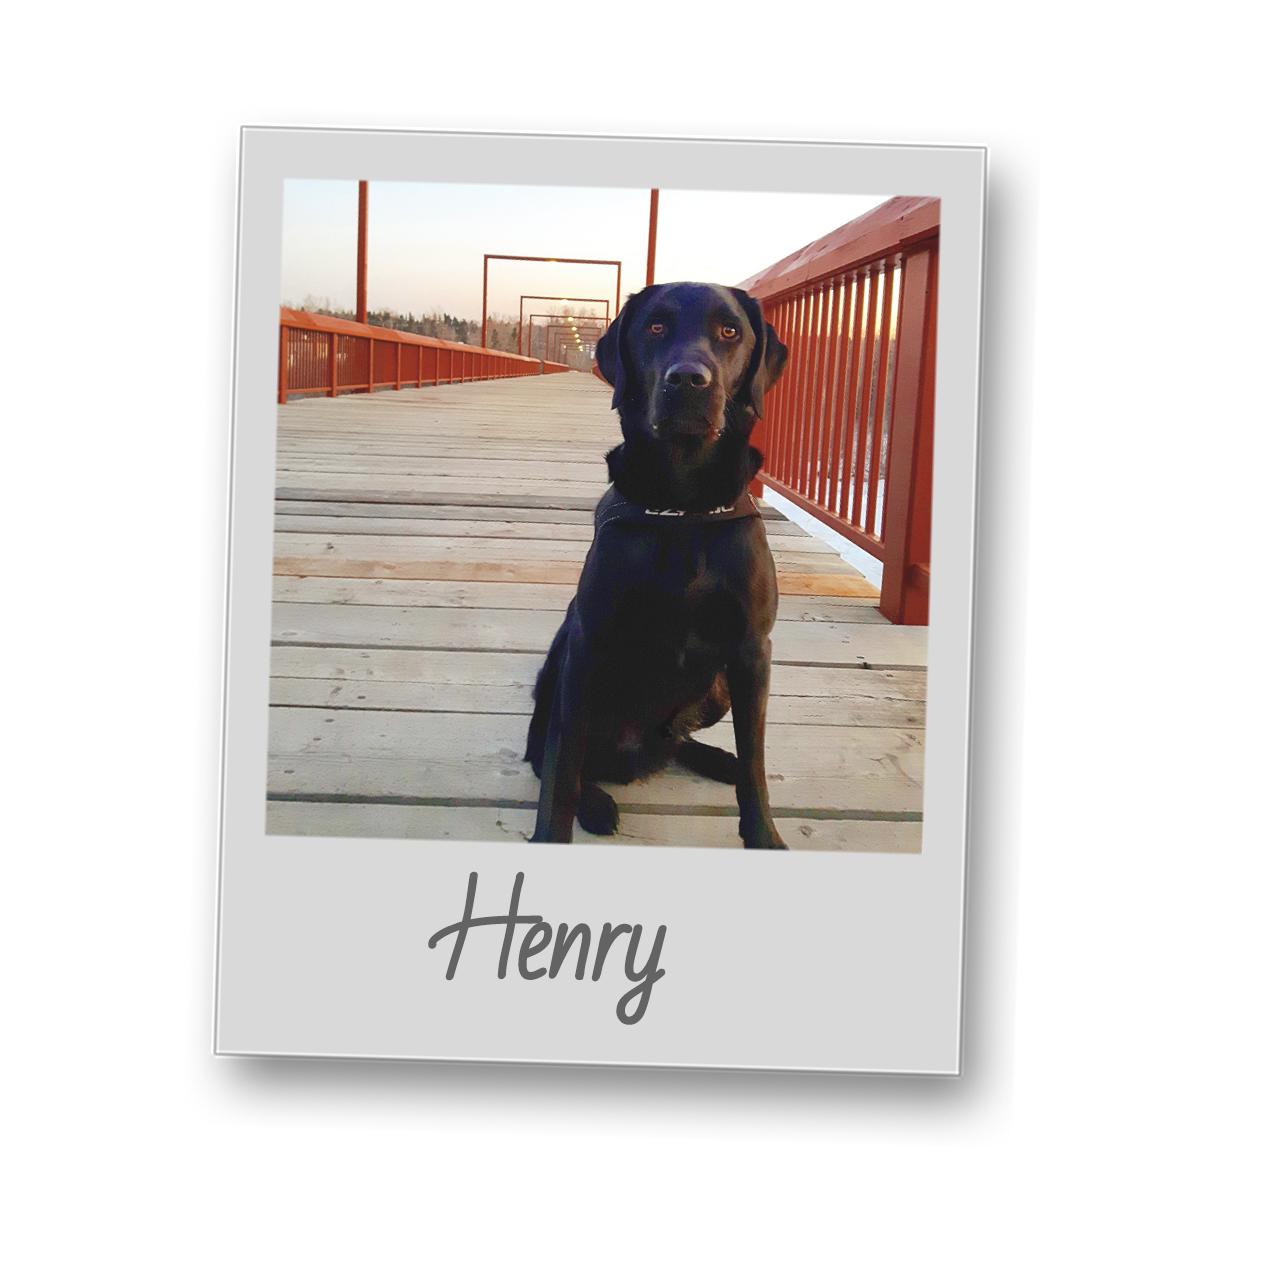 Henry   polaroid pets   resize to 500x500